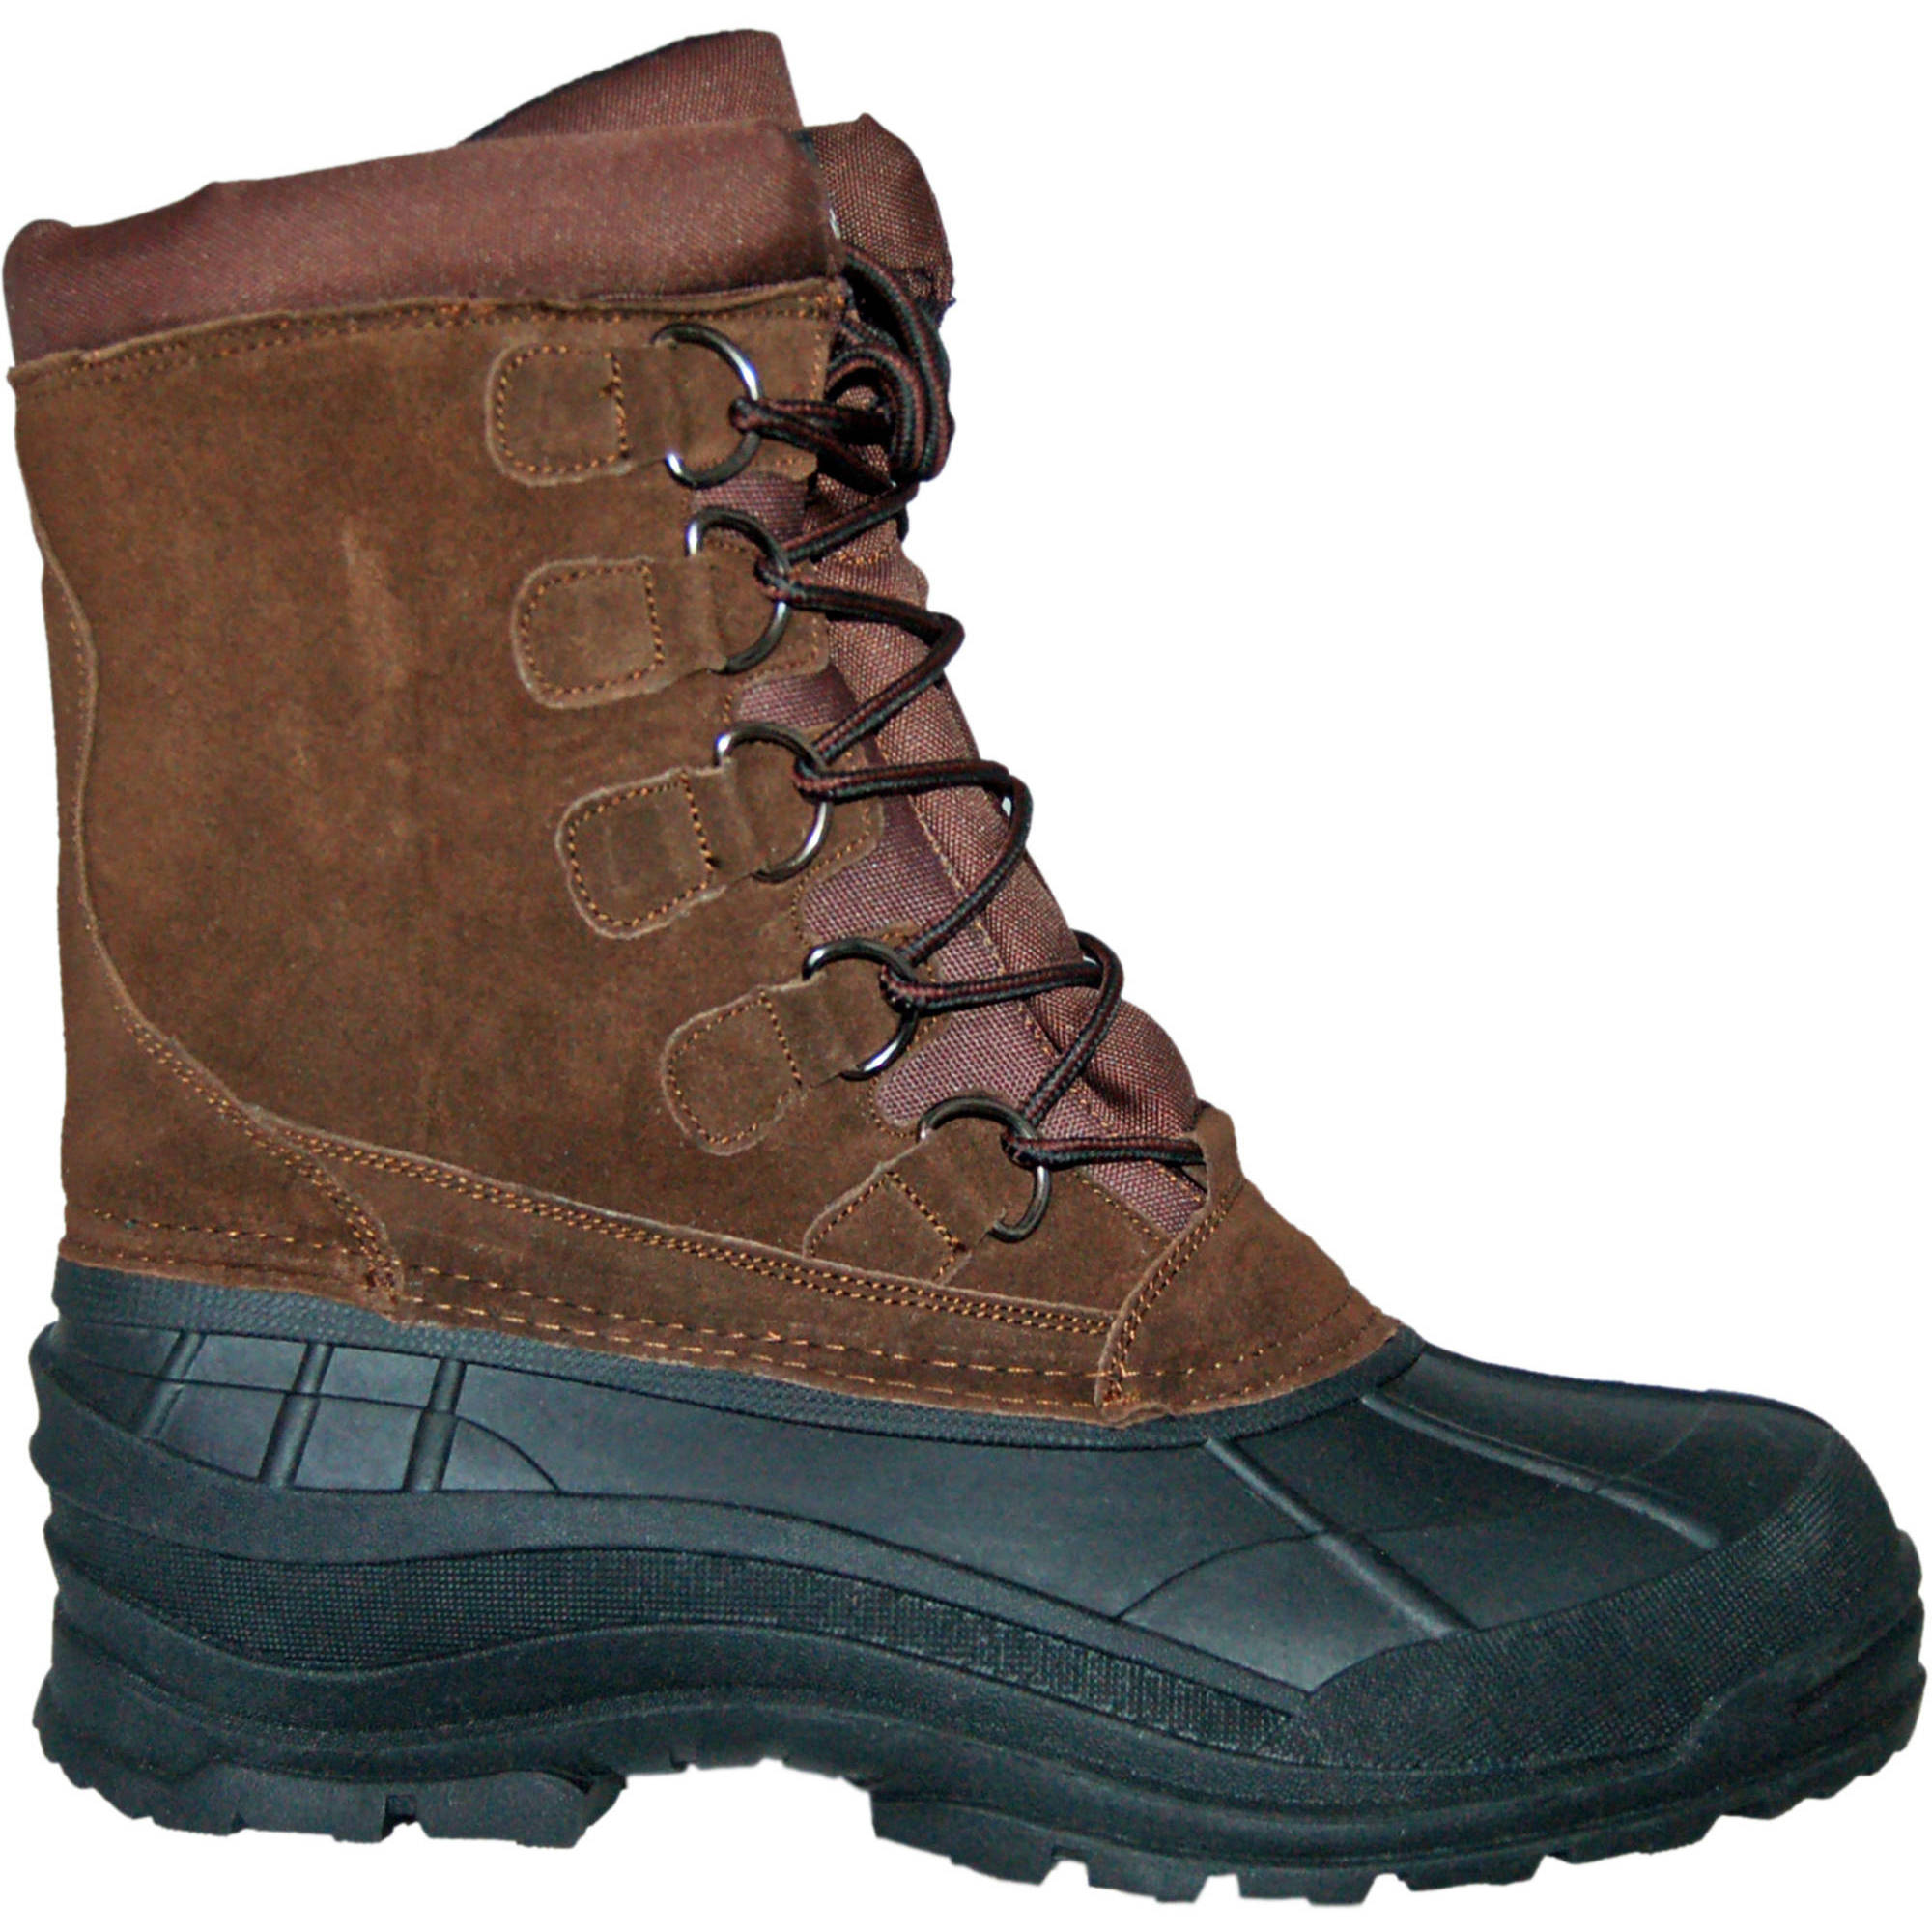 Cold Front Men's Trekker Boot